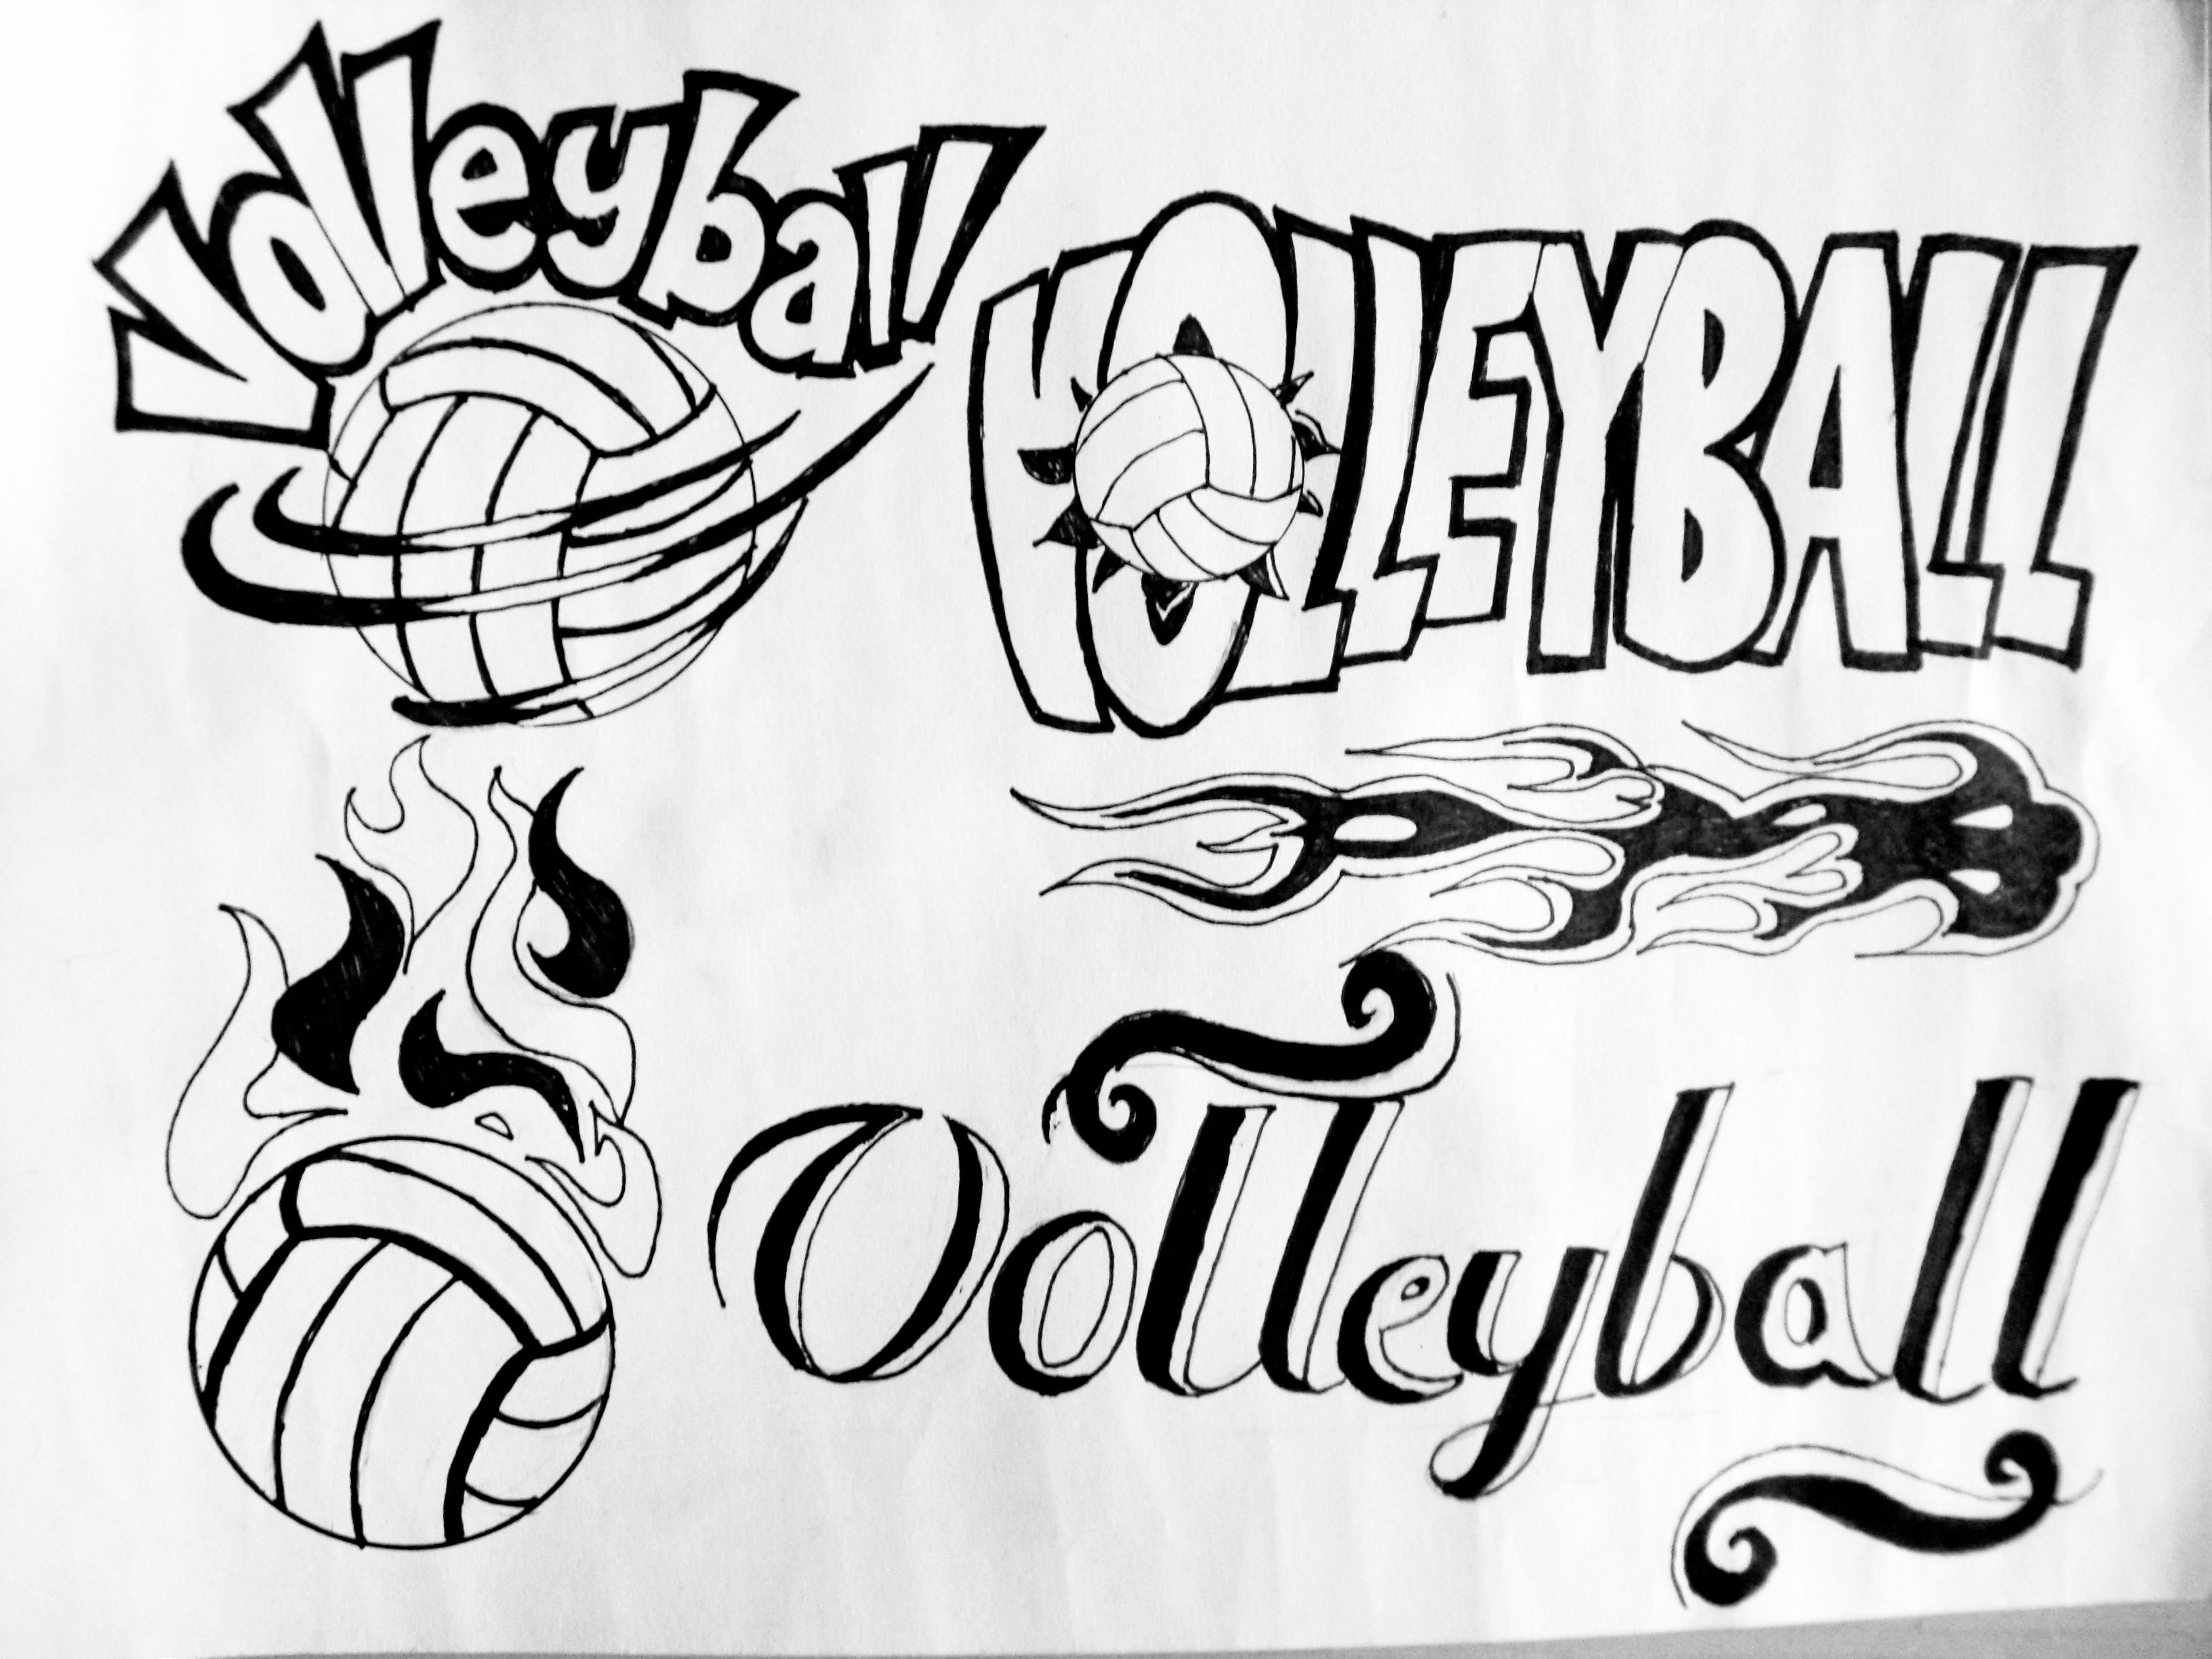 Artwork Volleyball Poster/Logo Design Volleyball